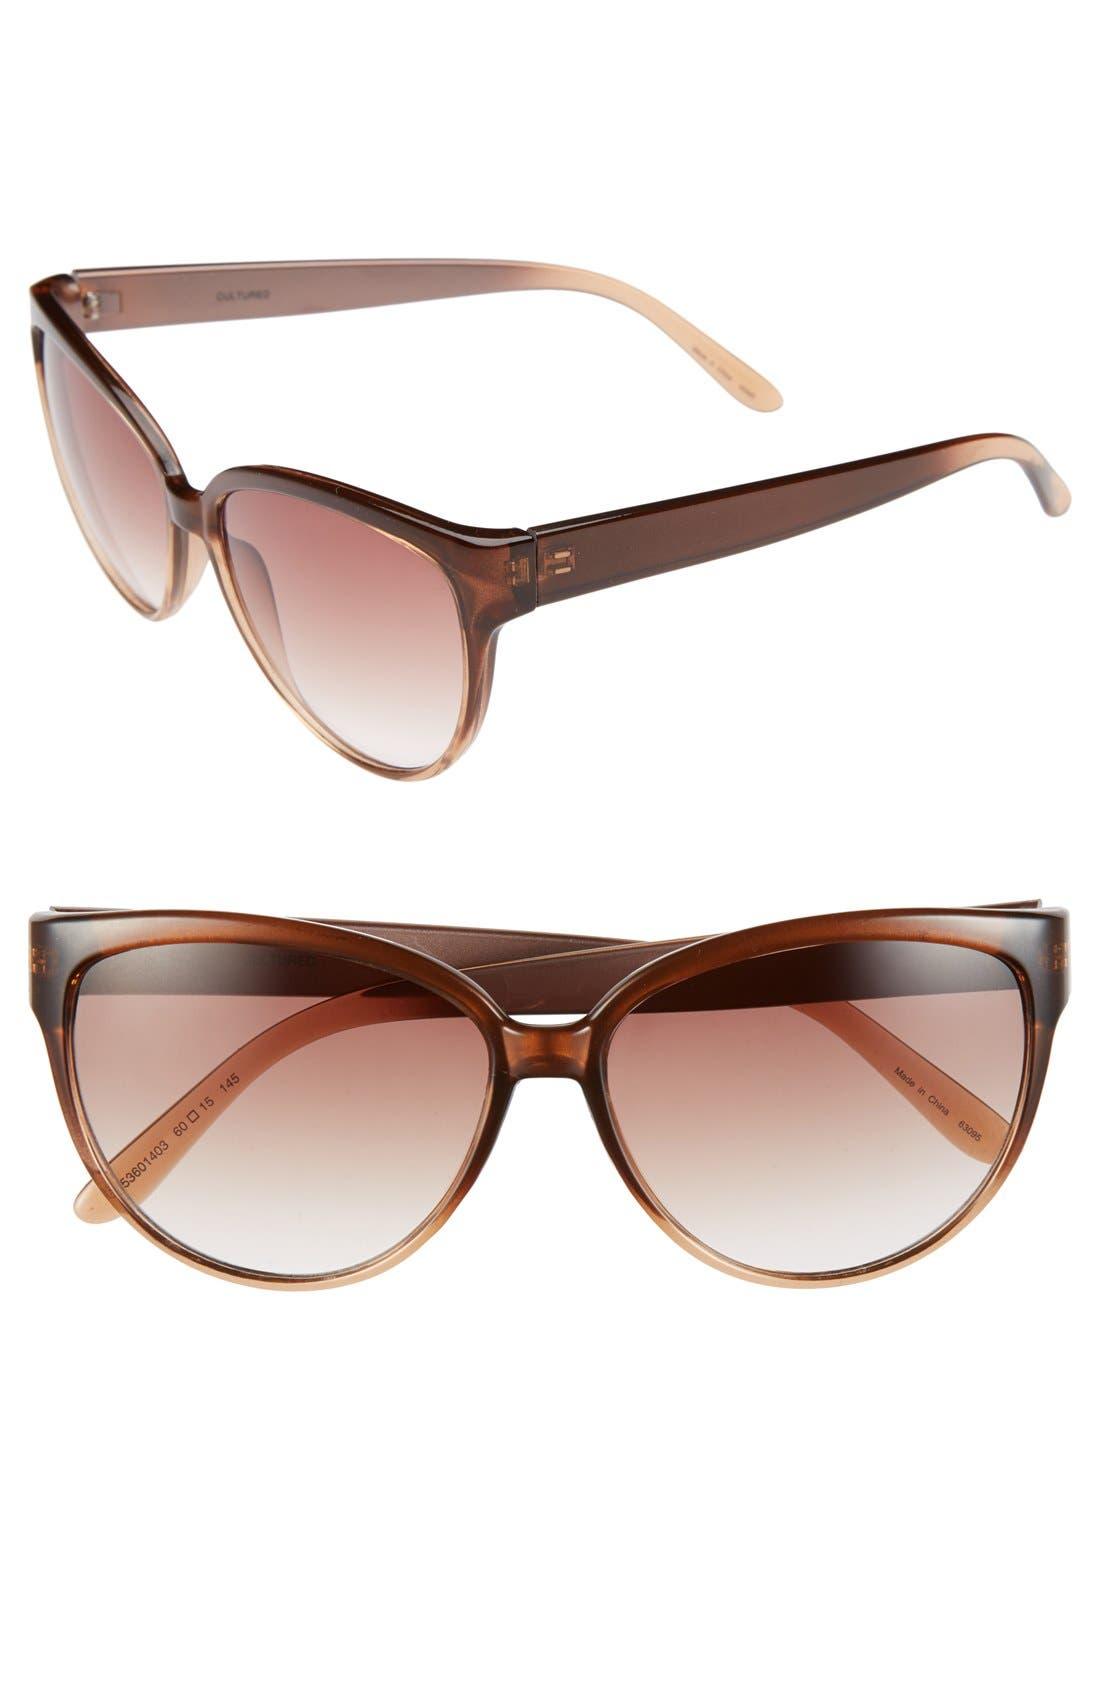 Main Image - Outlook Eyewear 60mm Cat Eye Sunglasses